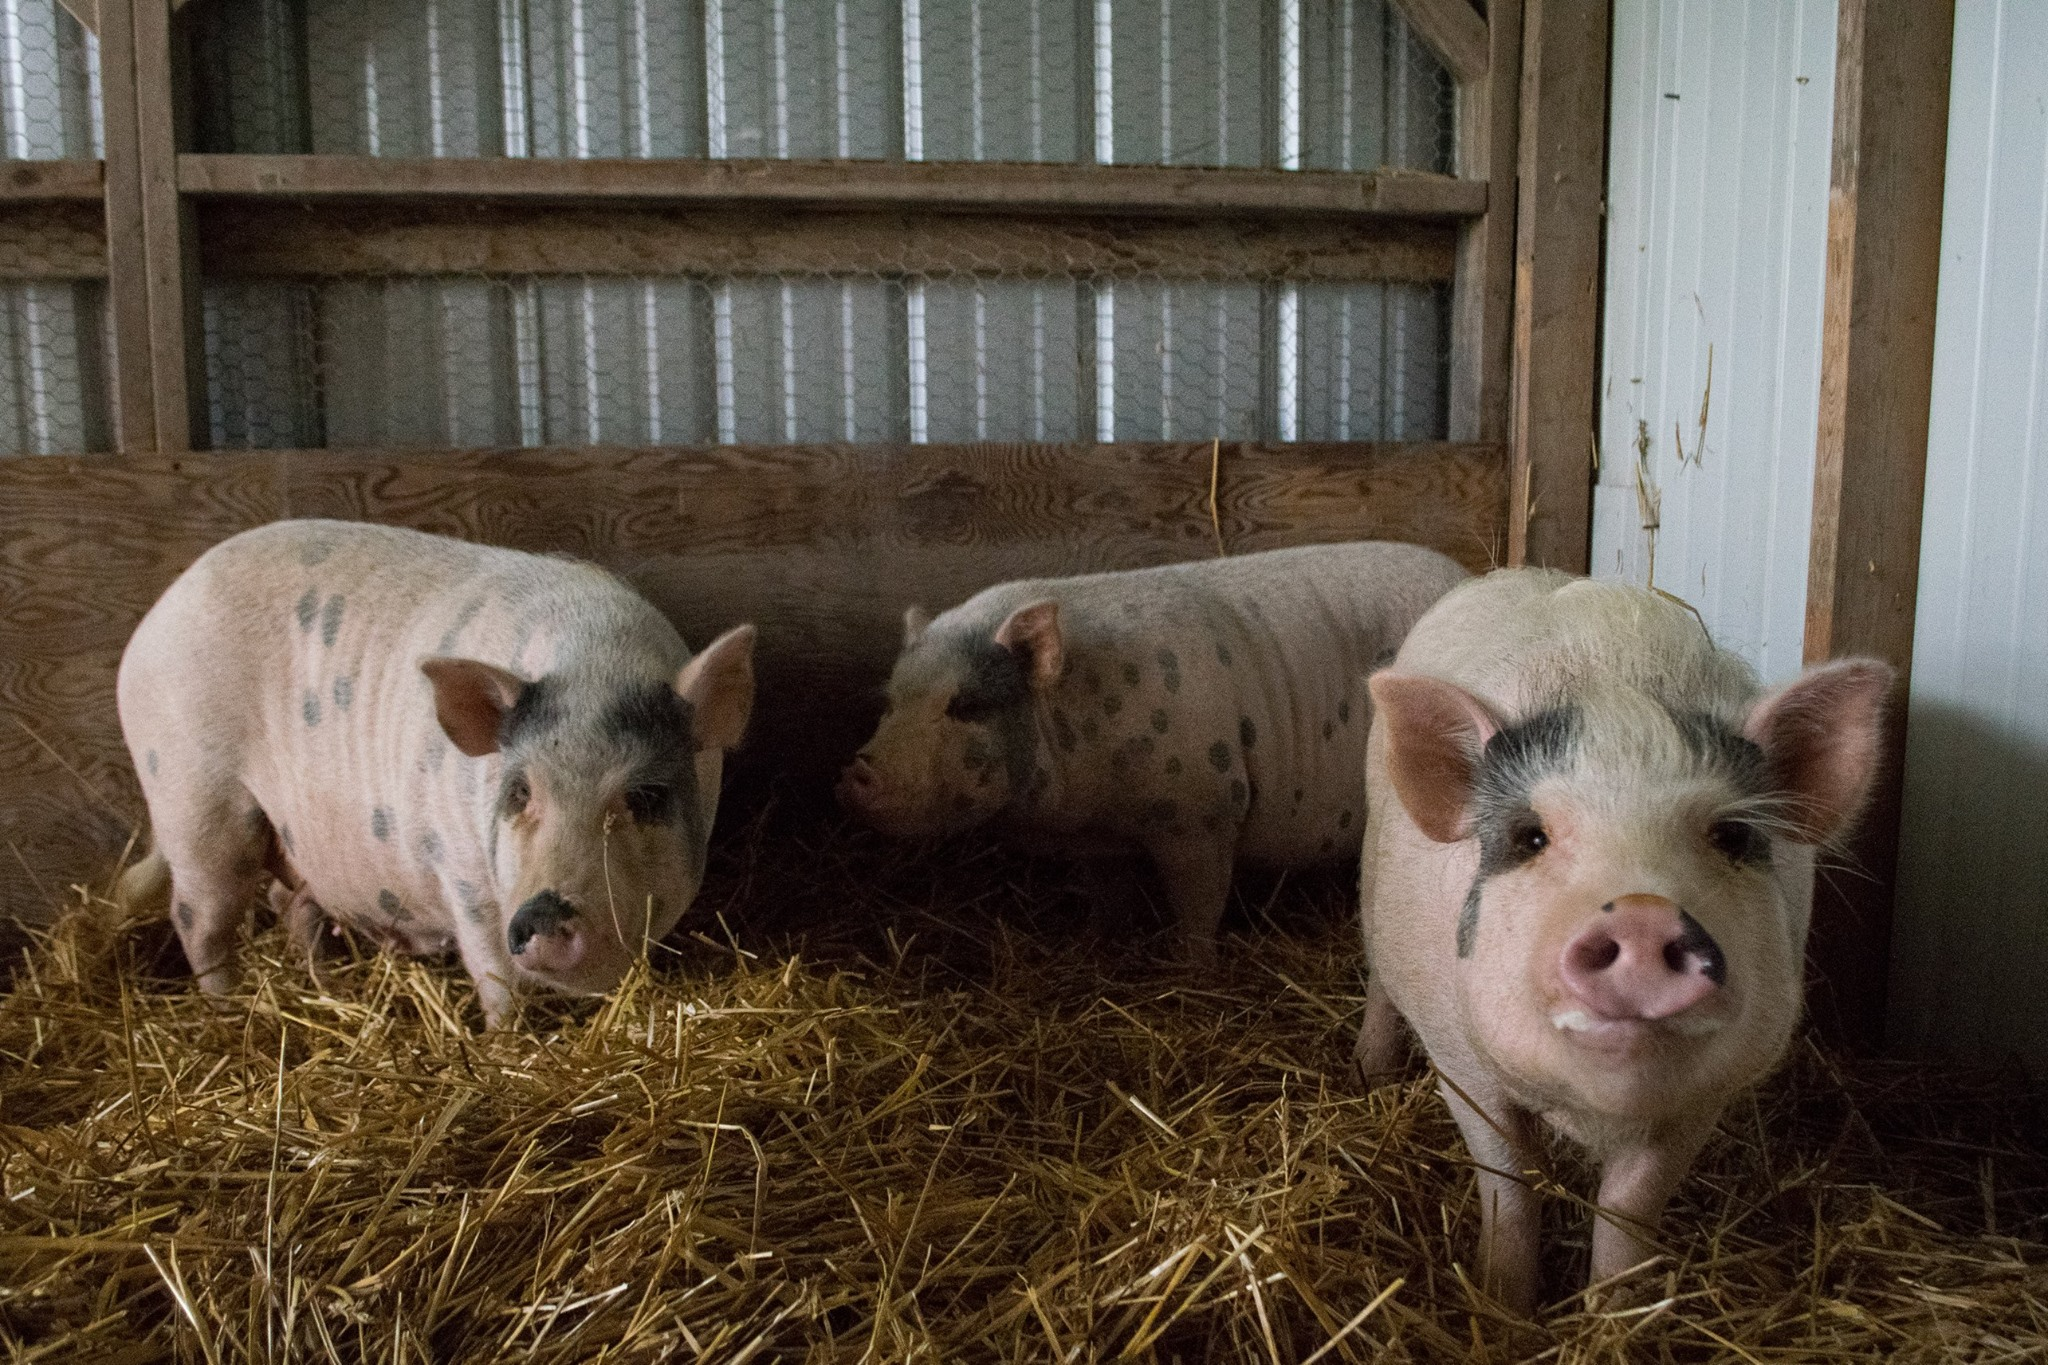 The Refuge's Temporary Pig Family